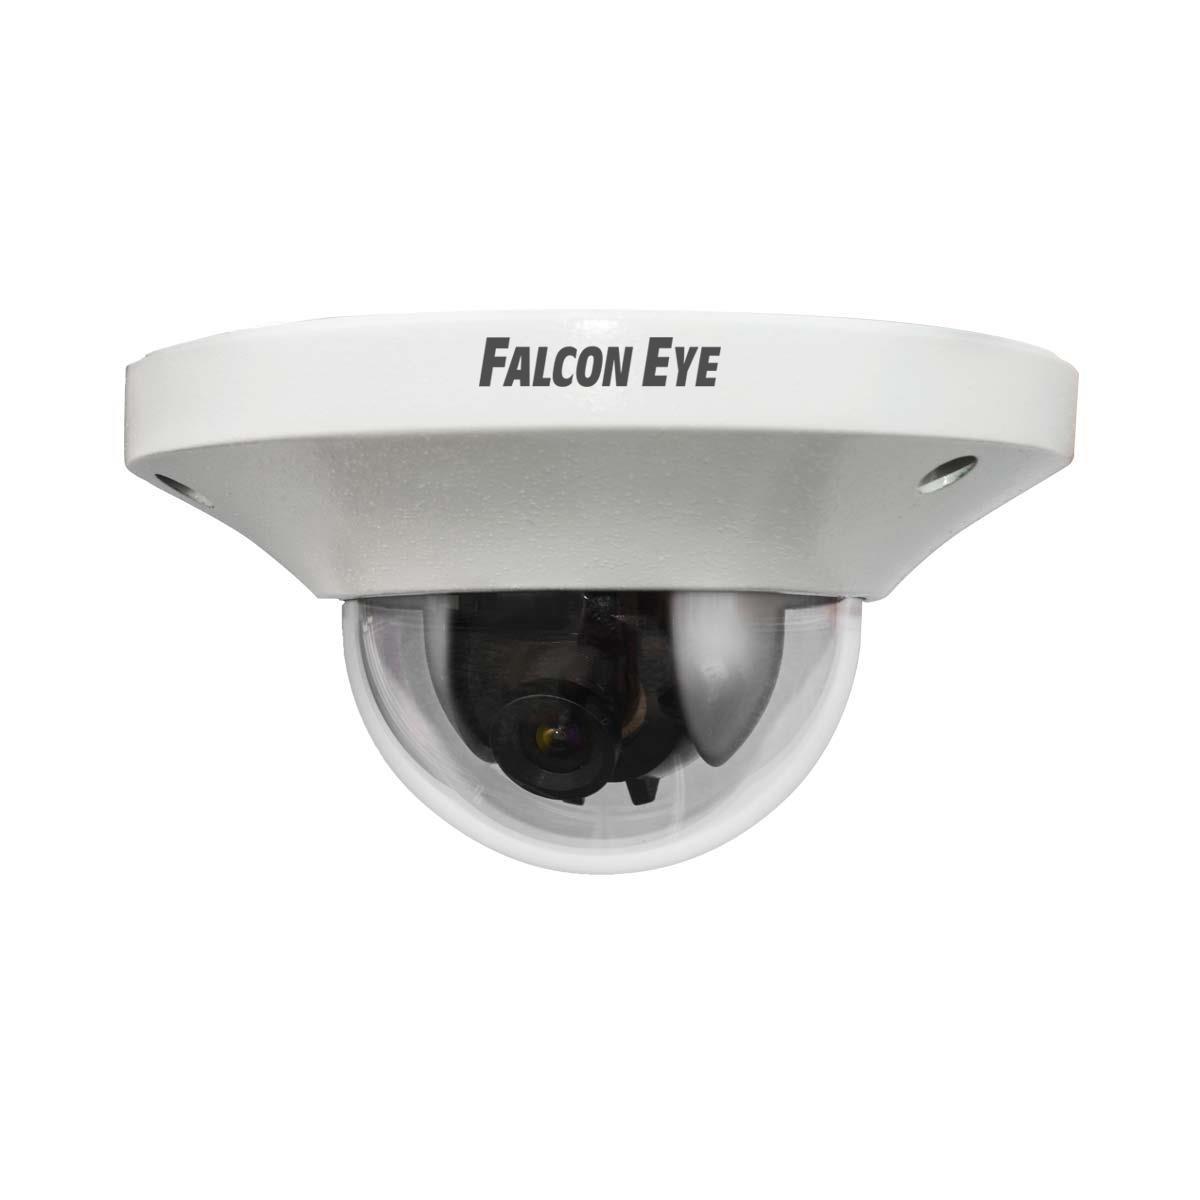 Фото. Камера видеонаблюдения Falcon eye Fe-ipc-dw200p